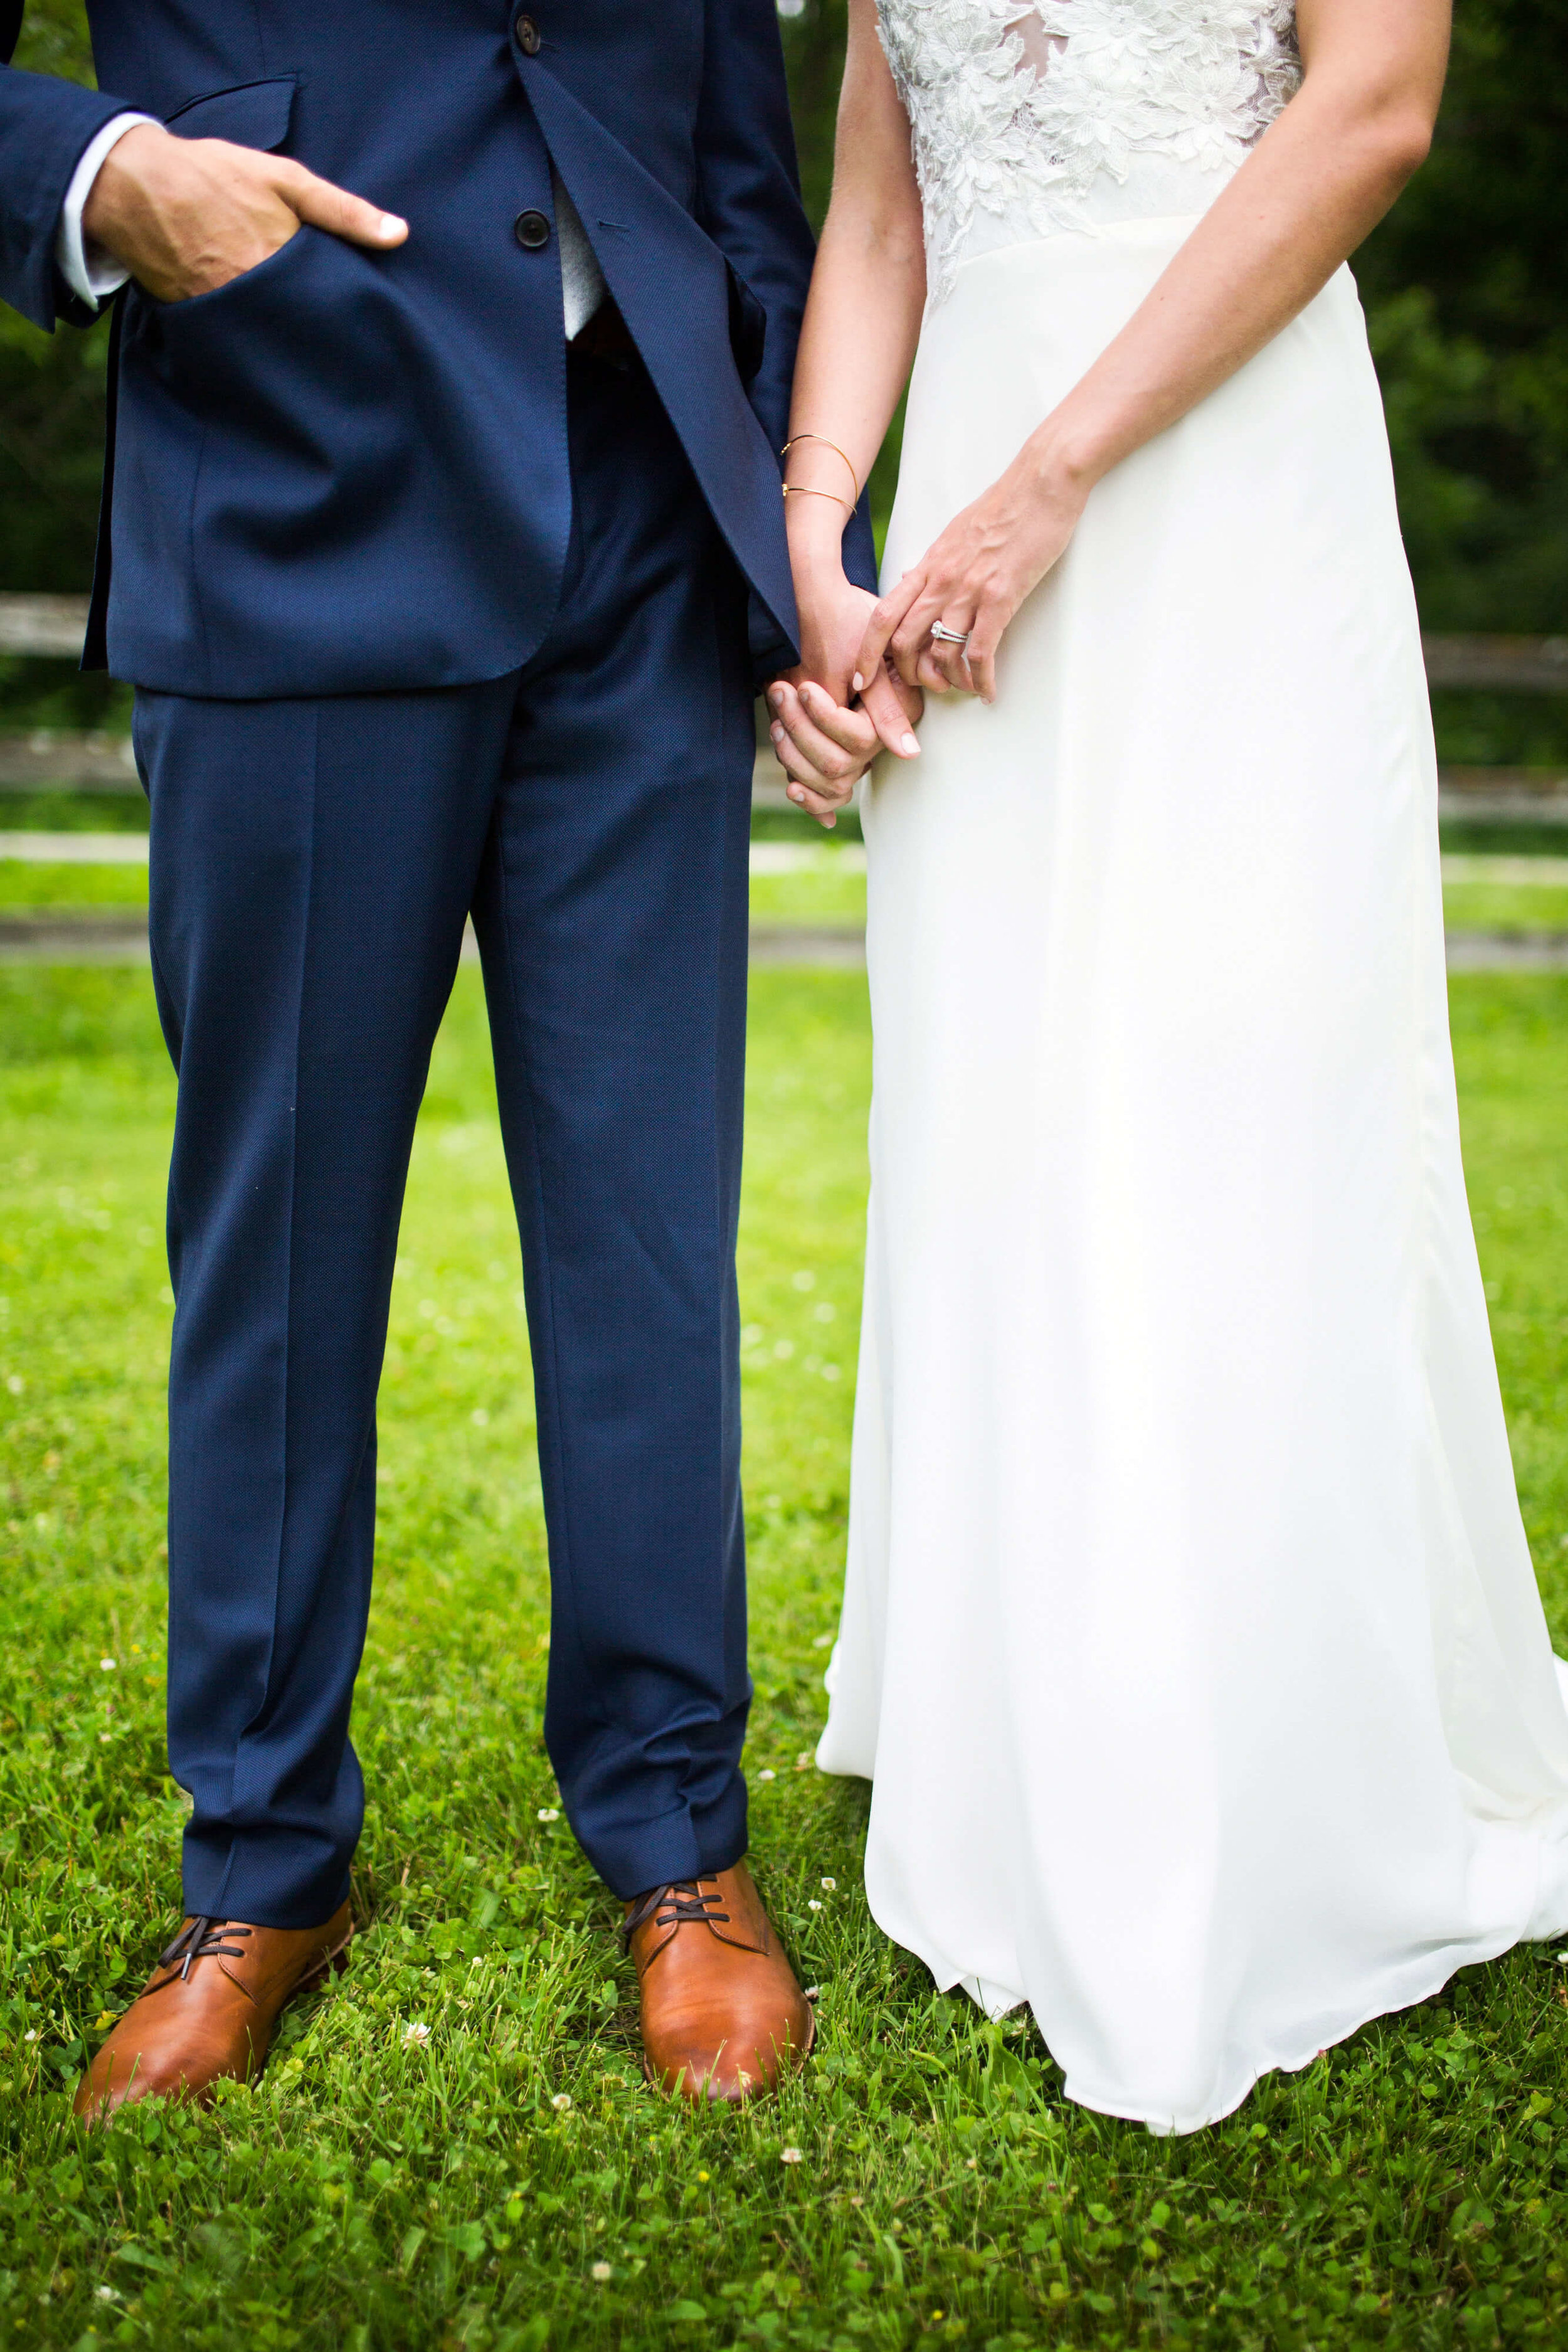 bride and groom holding hands | groom with hand in pocket | Minnesota wedding photographer Studio KH wedding dress details | wedding blog | Sixpence Events 70 Ways to Photograph Your Wedding Dress.jpg